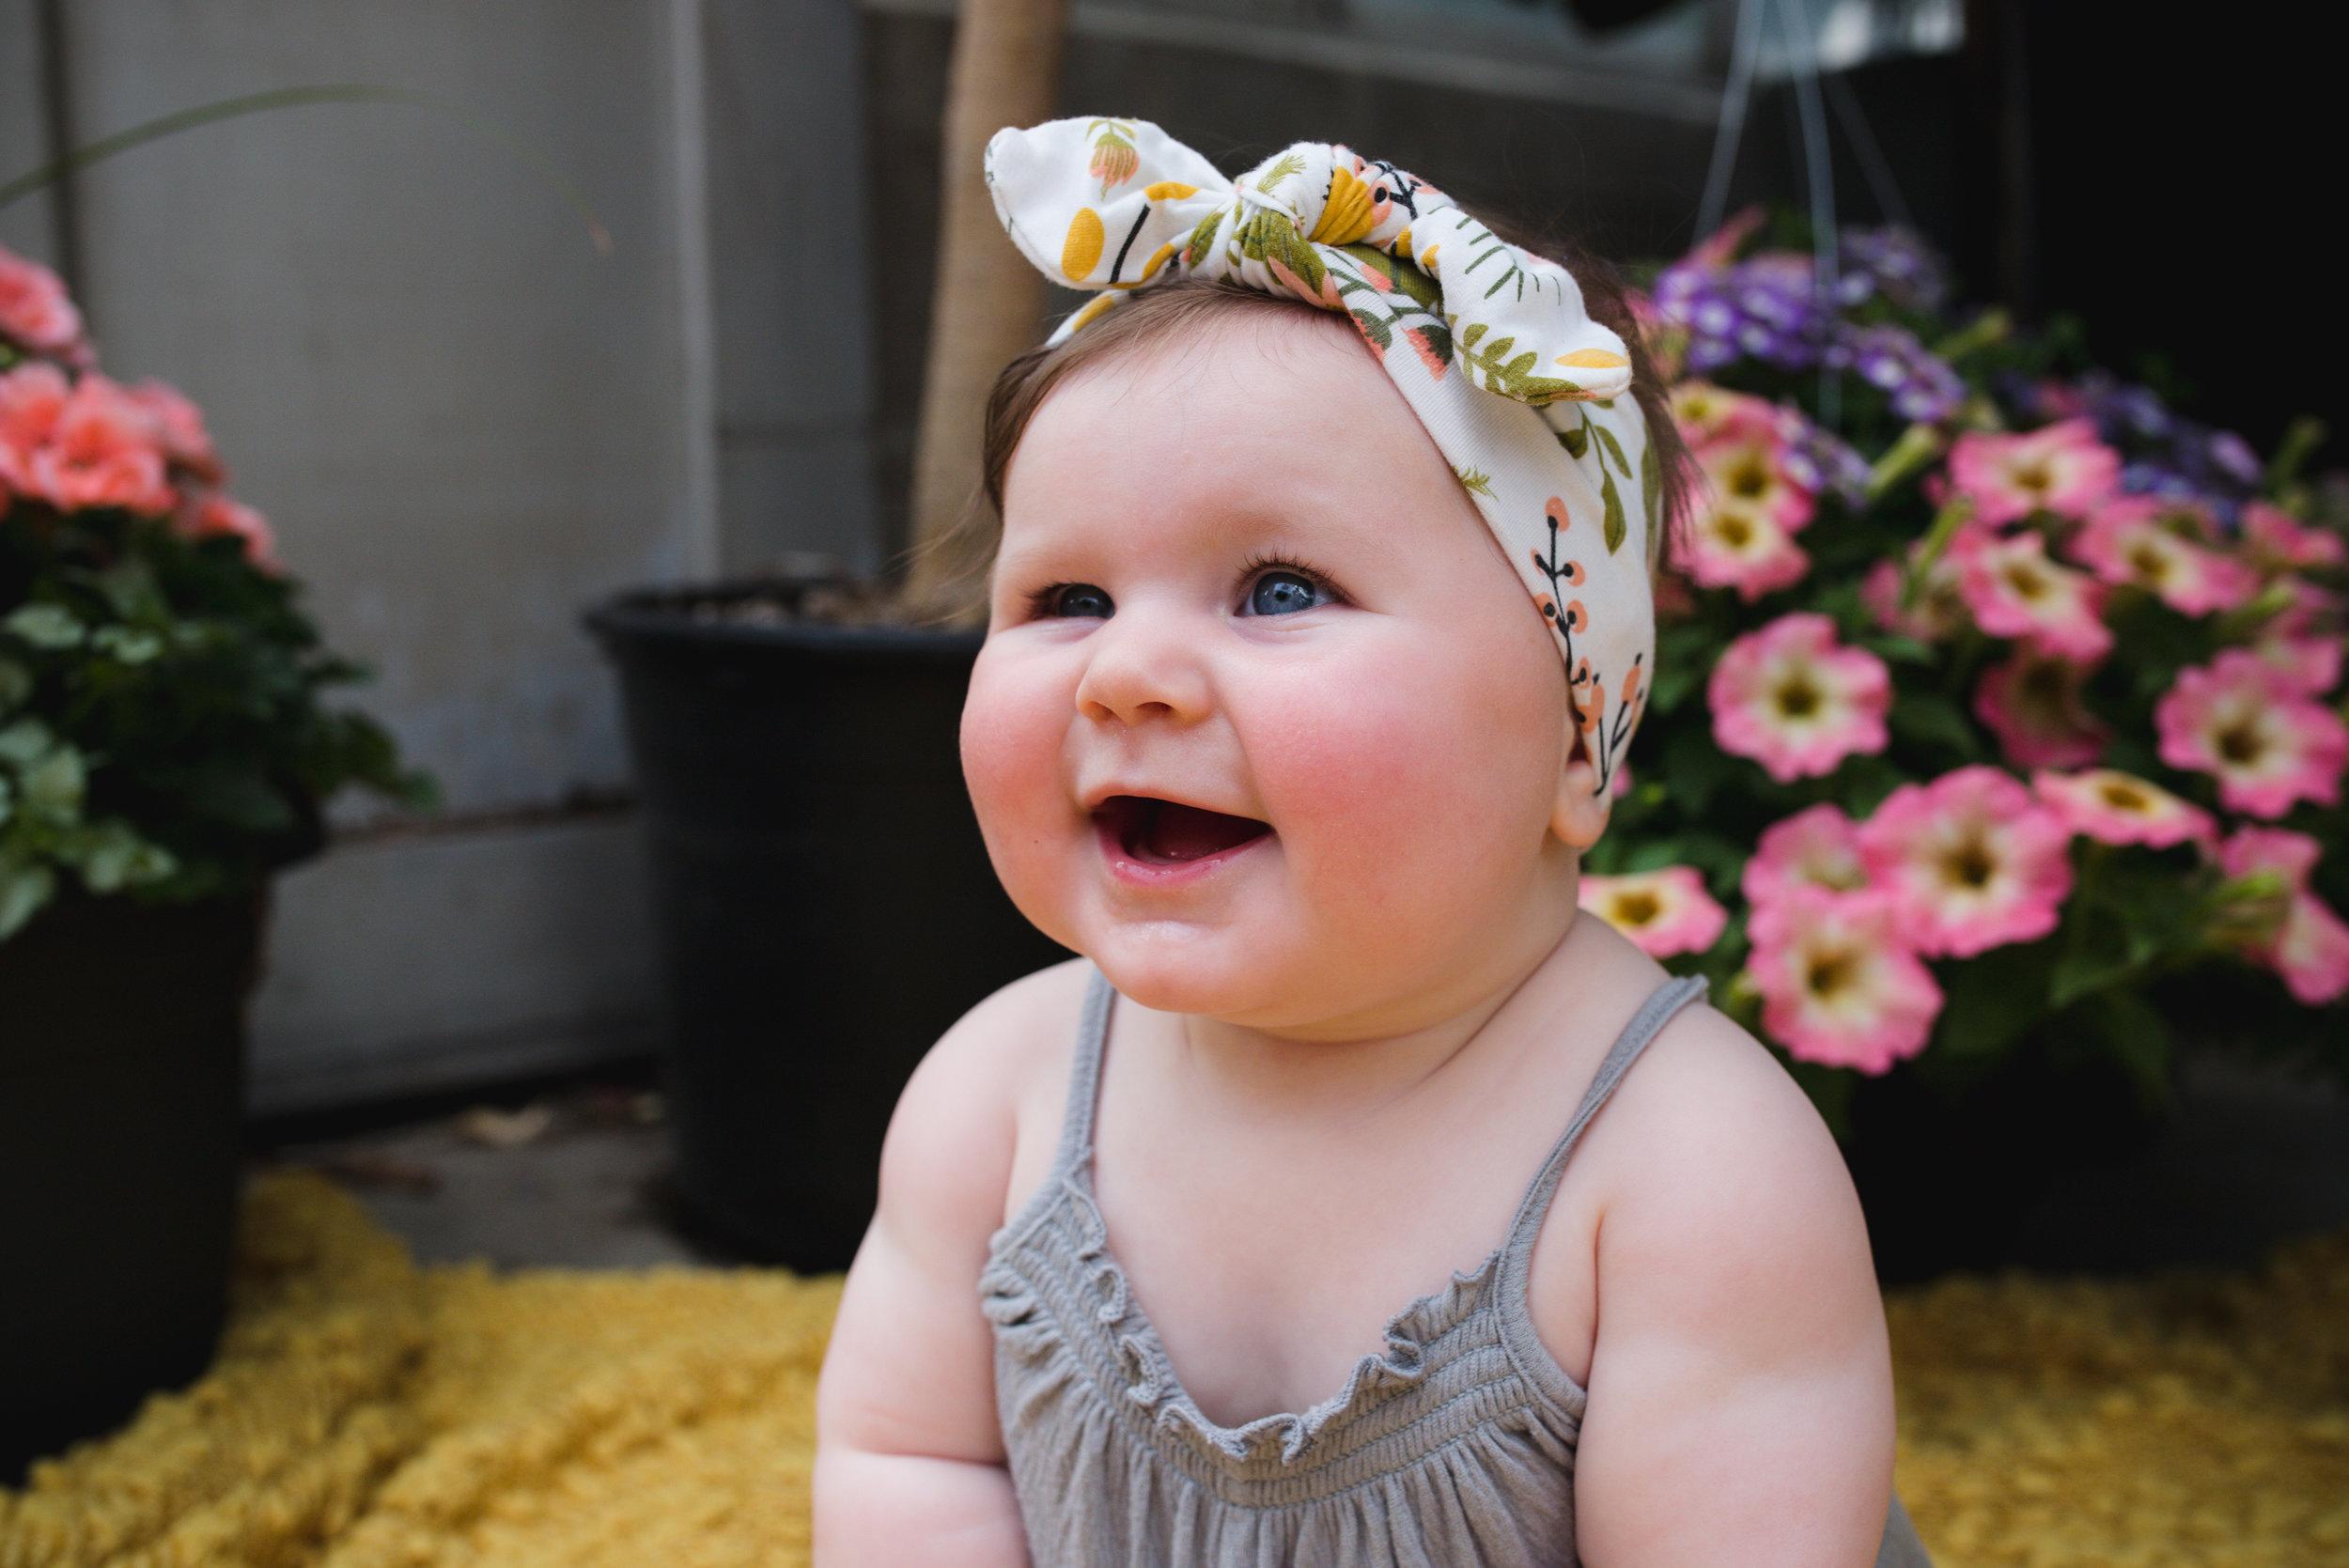 A baby girl smiling in Cedar Rapids, Iowa.